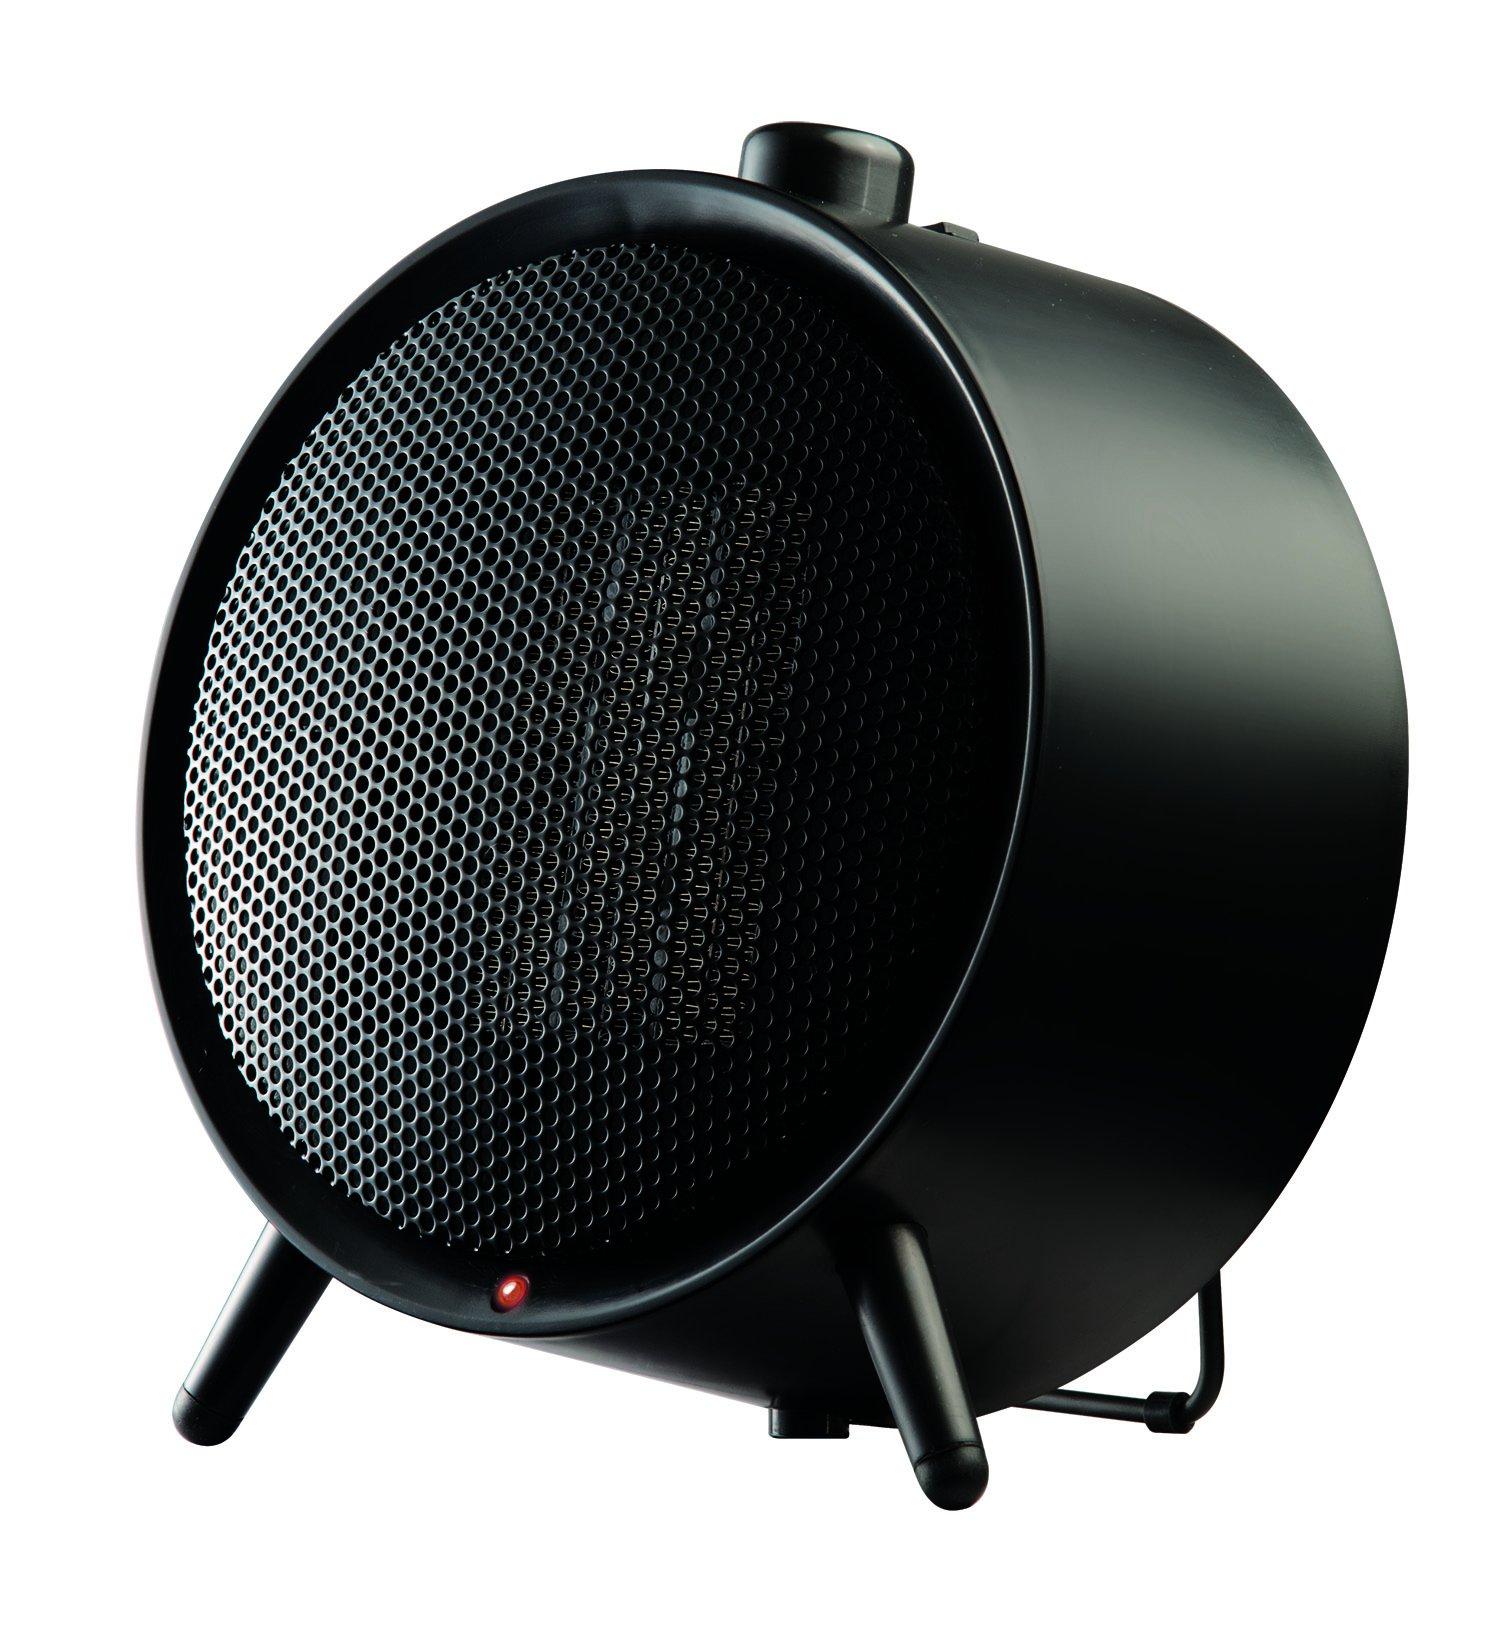 Honeywell HCE200B Uberheat Ceramic Heater, Black by Honeywell